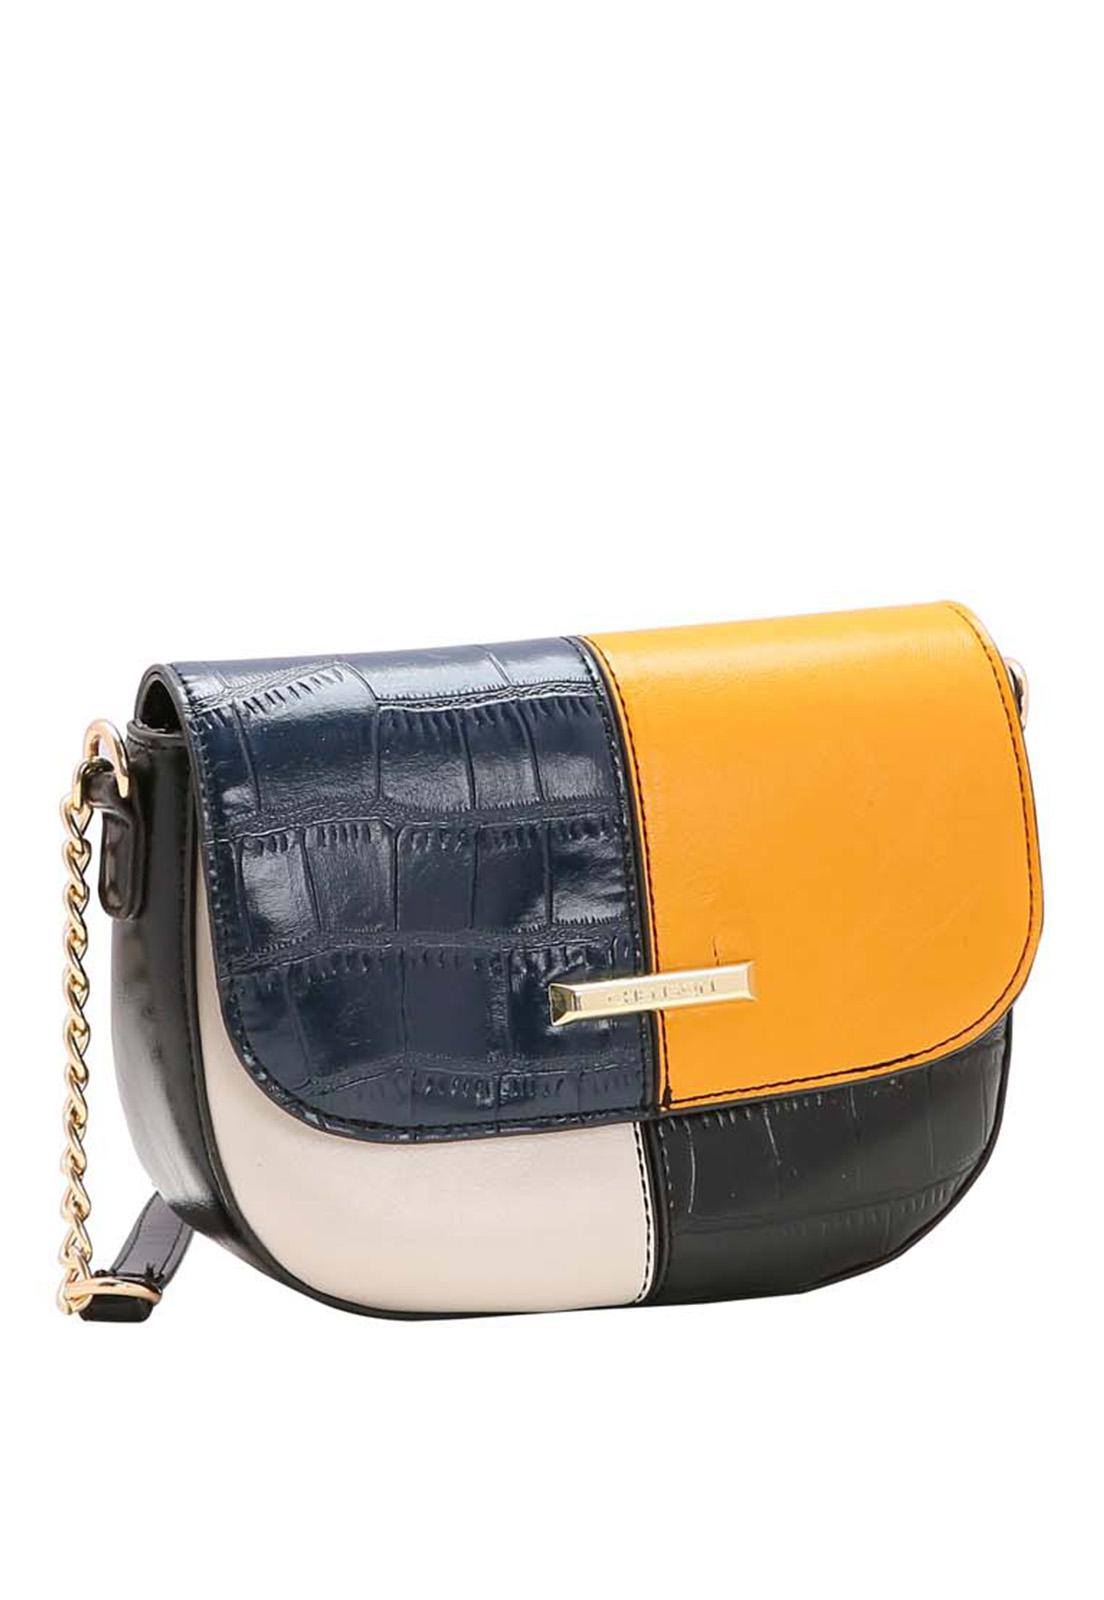 Bolsa Feminina Chenson Patchwork Croco Transversal 3483527